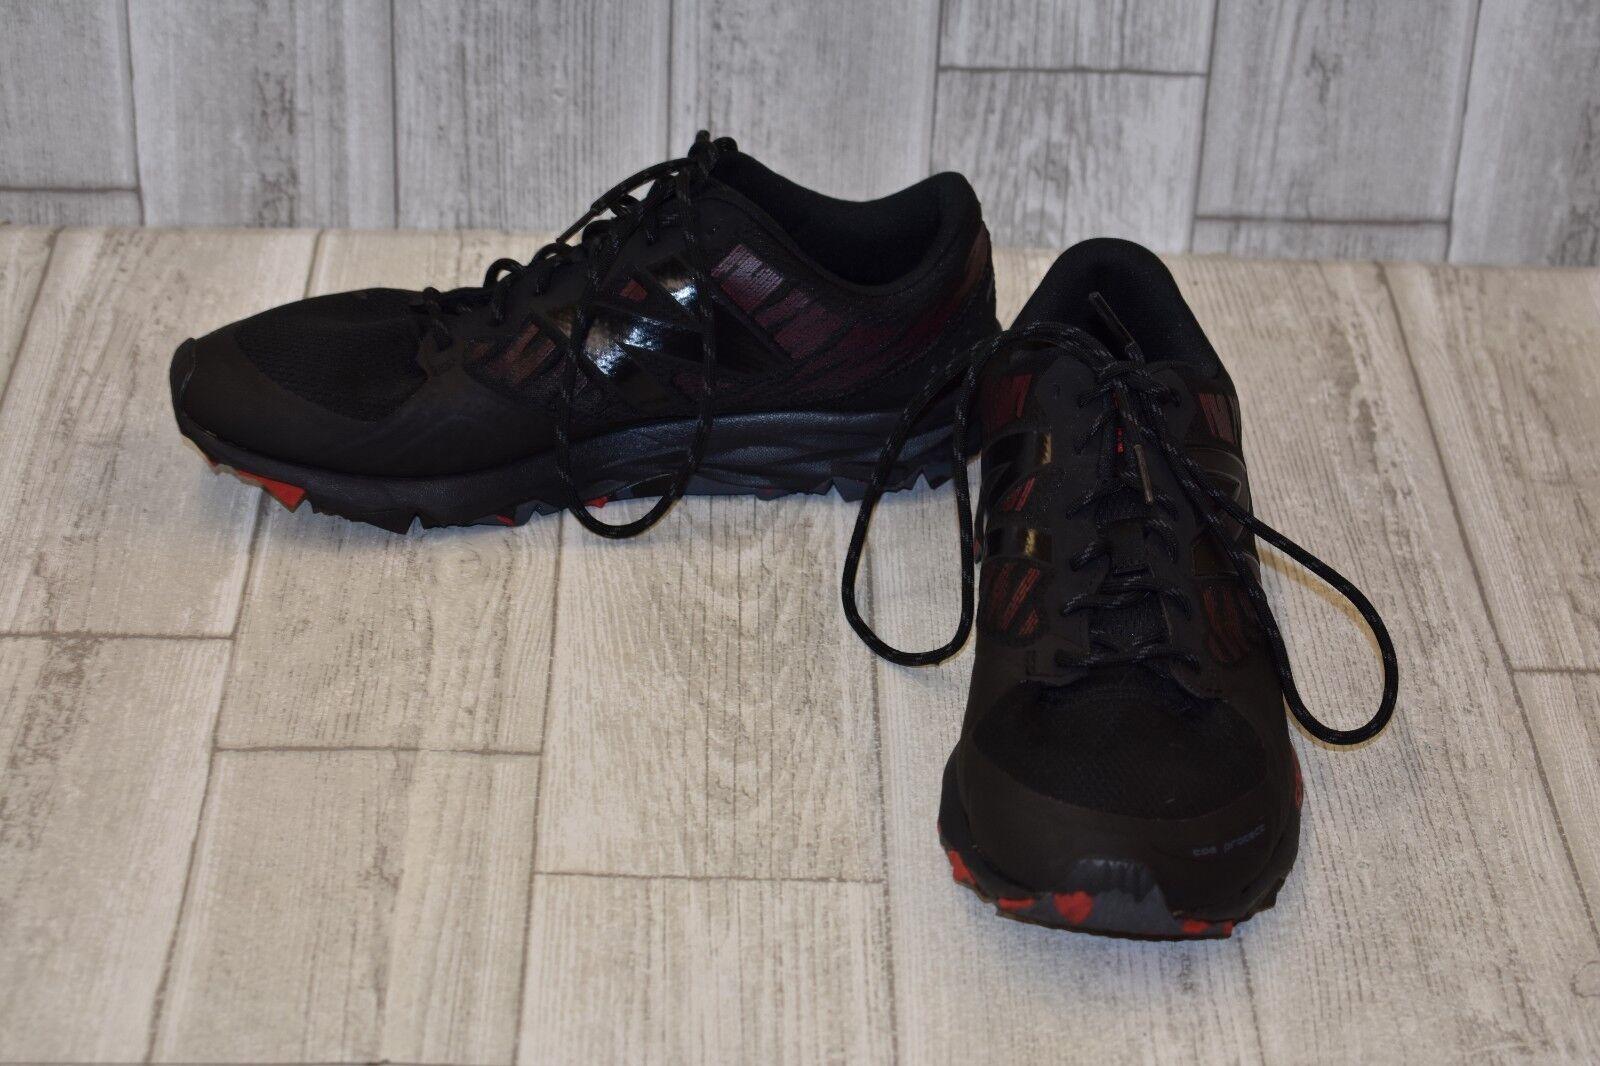 New Balance 690v2 Sneakers - Men's Size 9.5(4E) Black Red